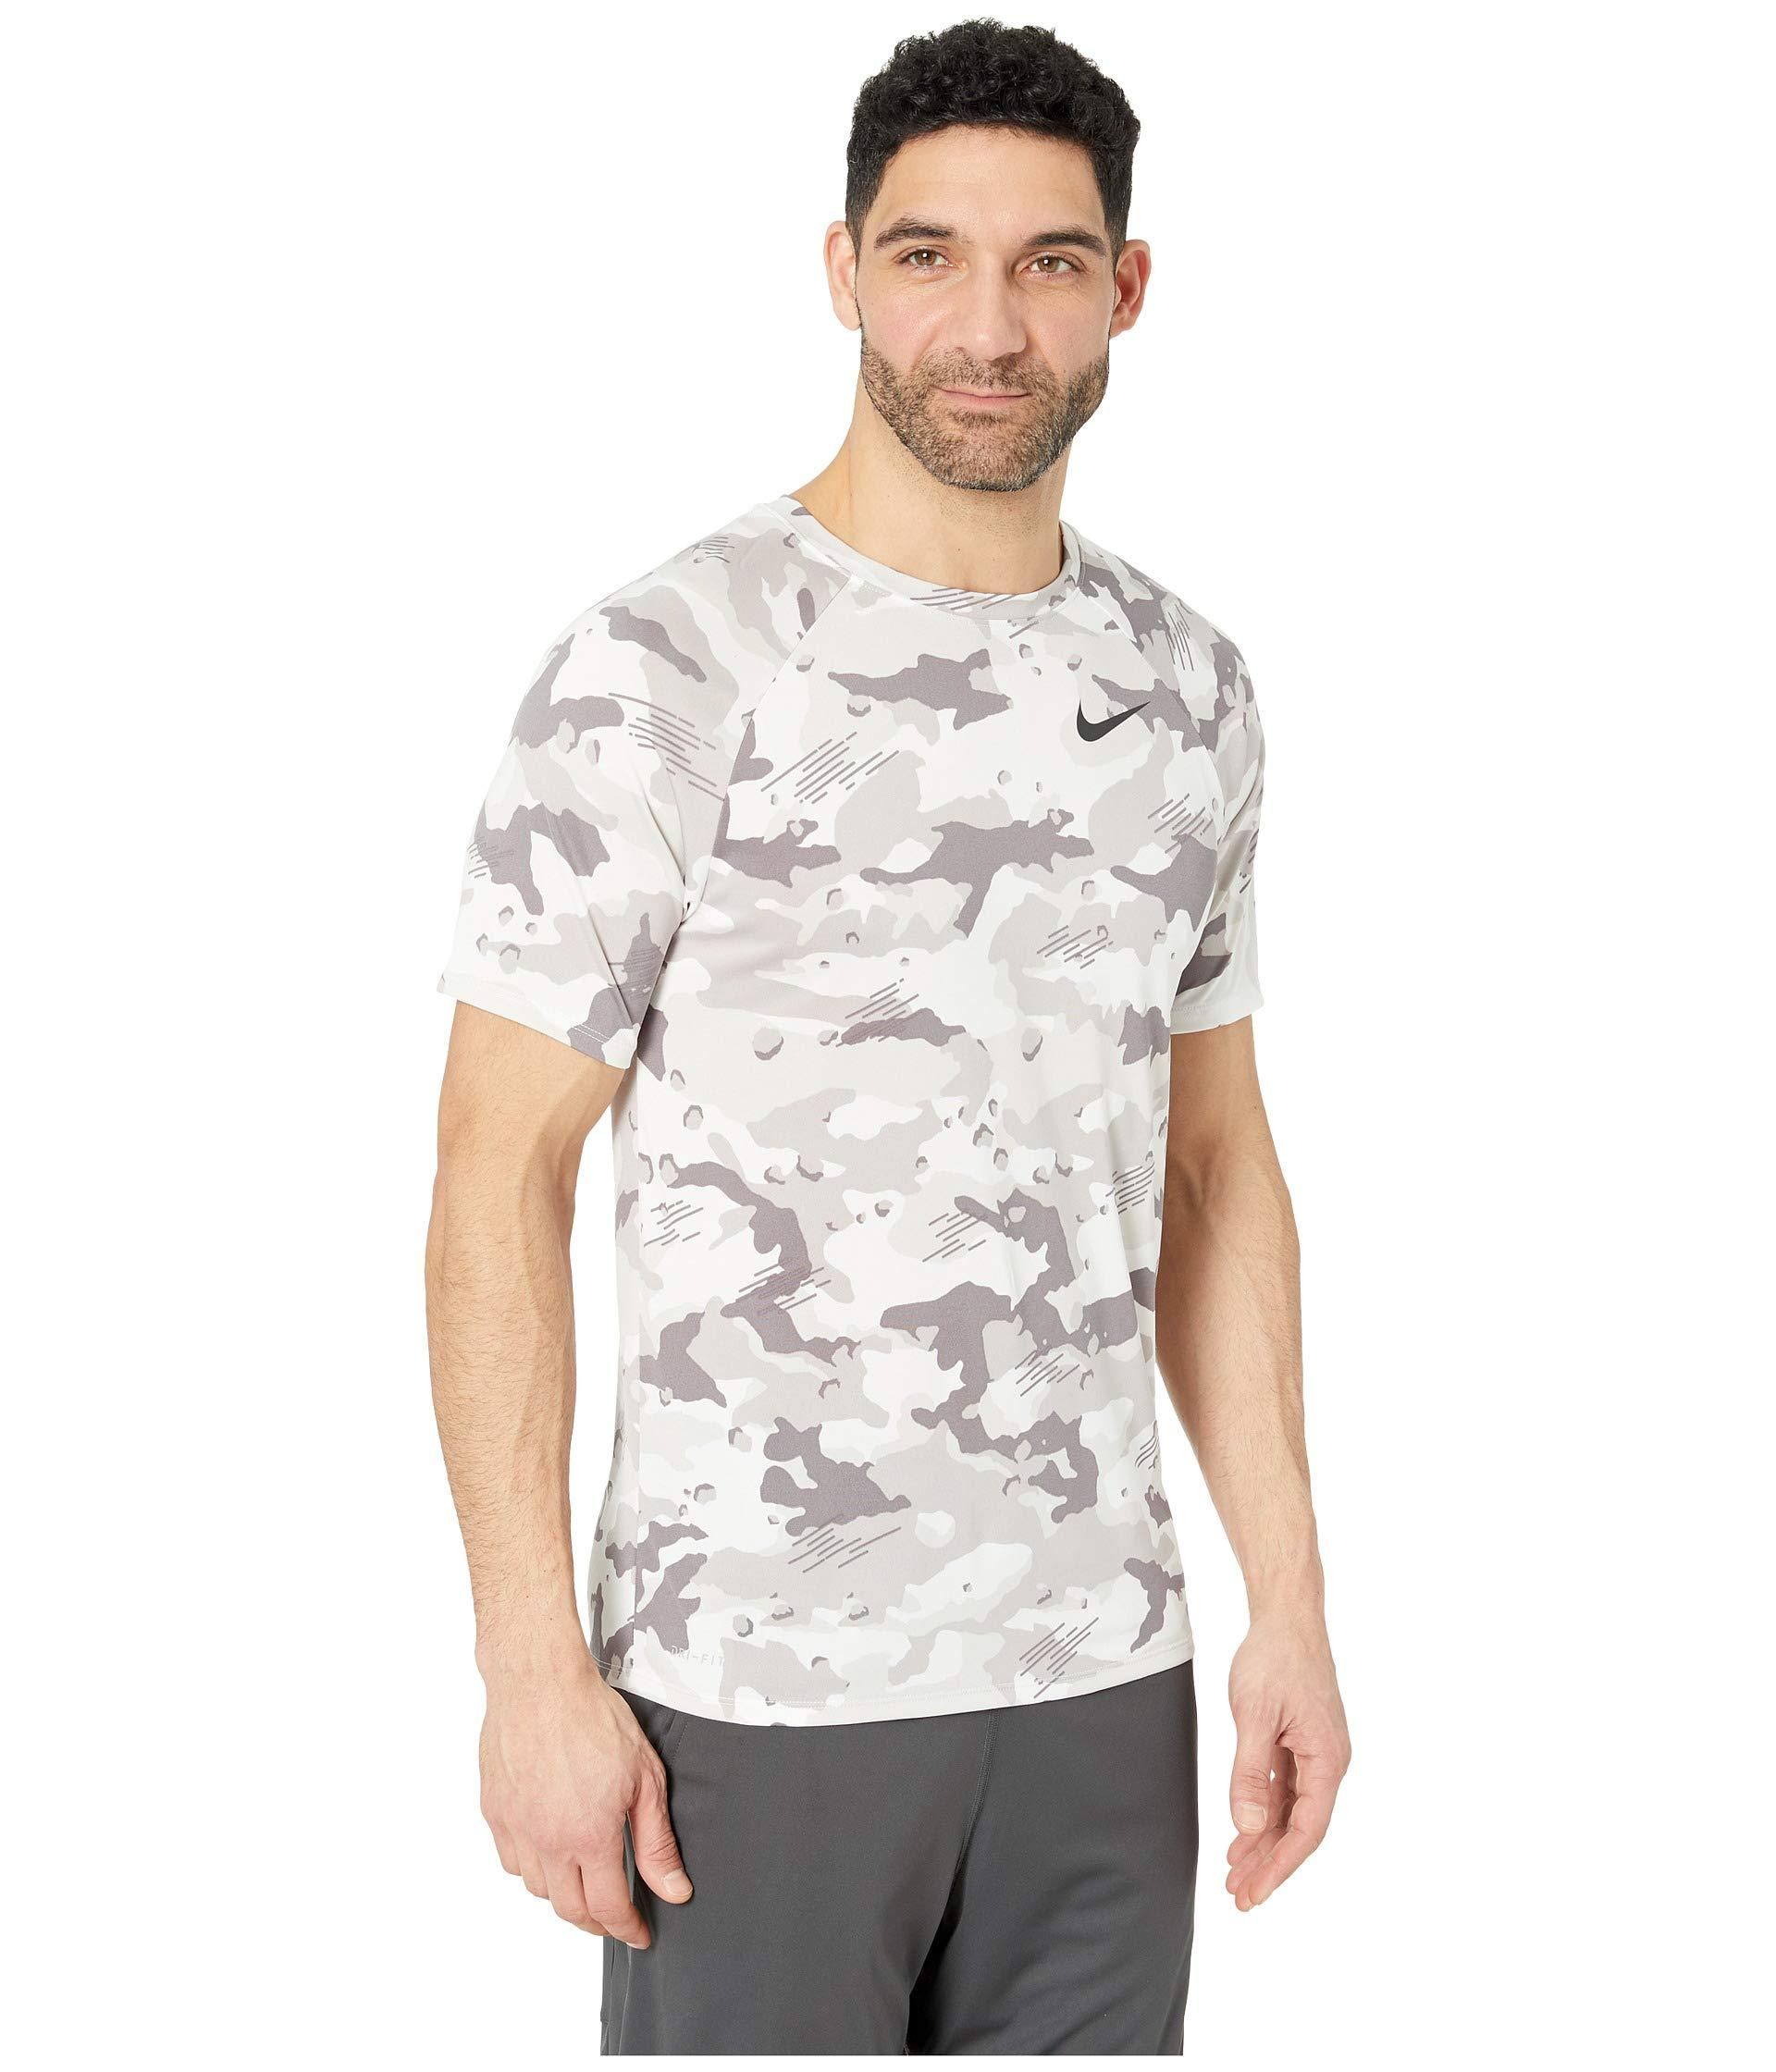 c0f3256c Nike - Dry Tee Dri-fittm Cotton Camo All Over Print (dark Grey/. View  fullscreen